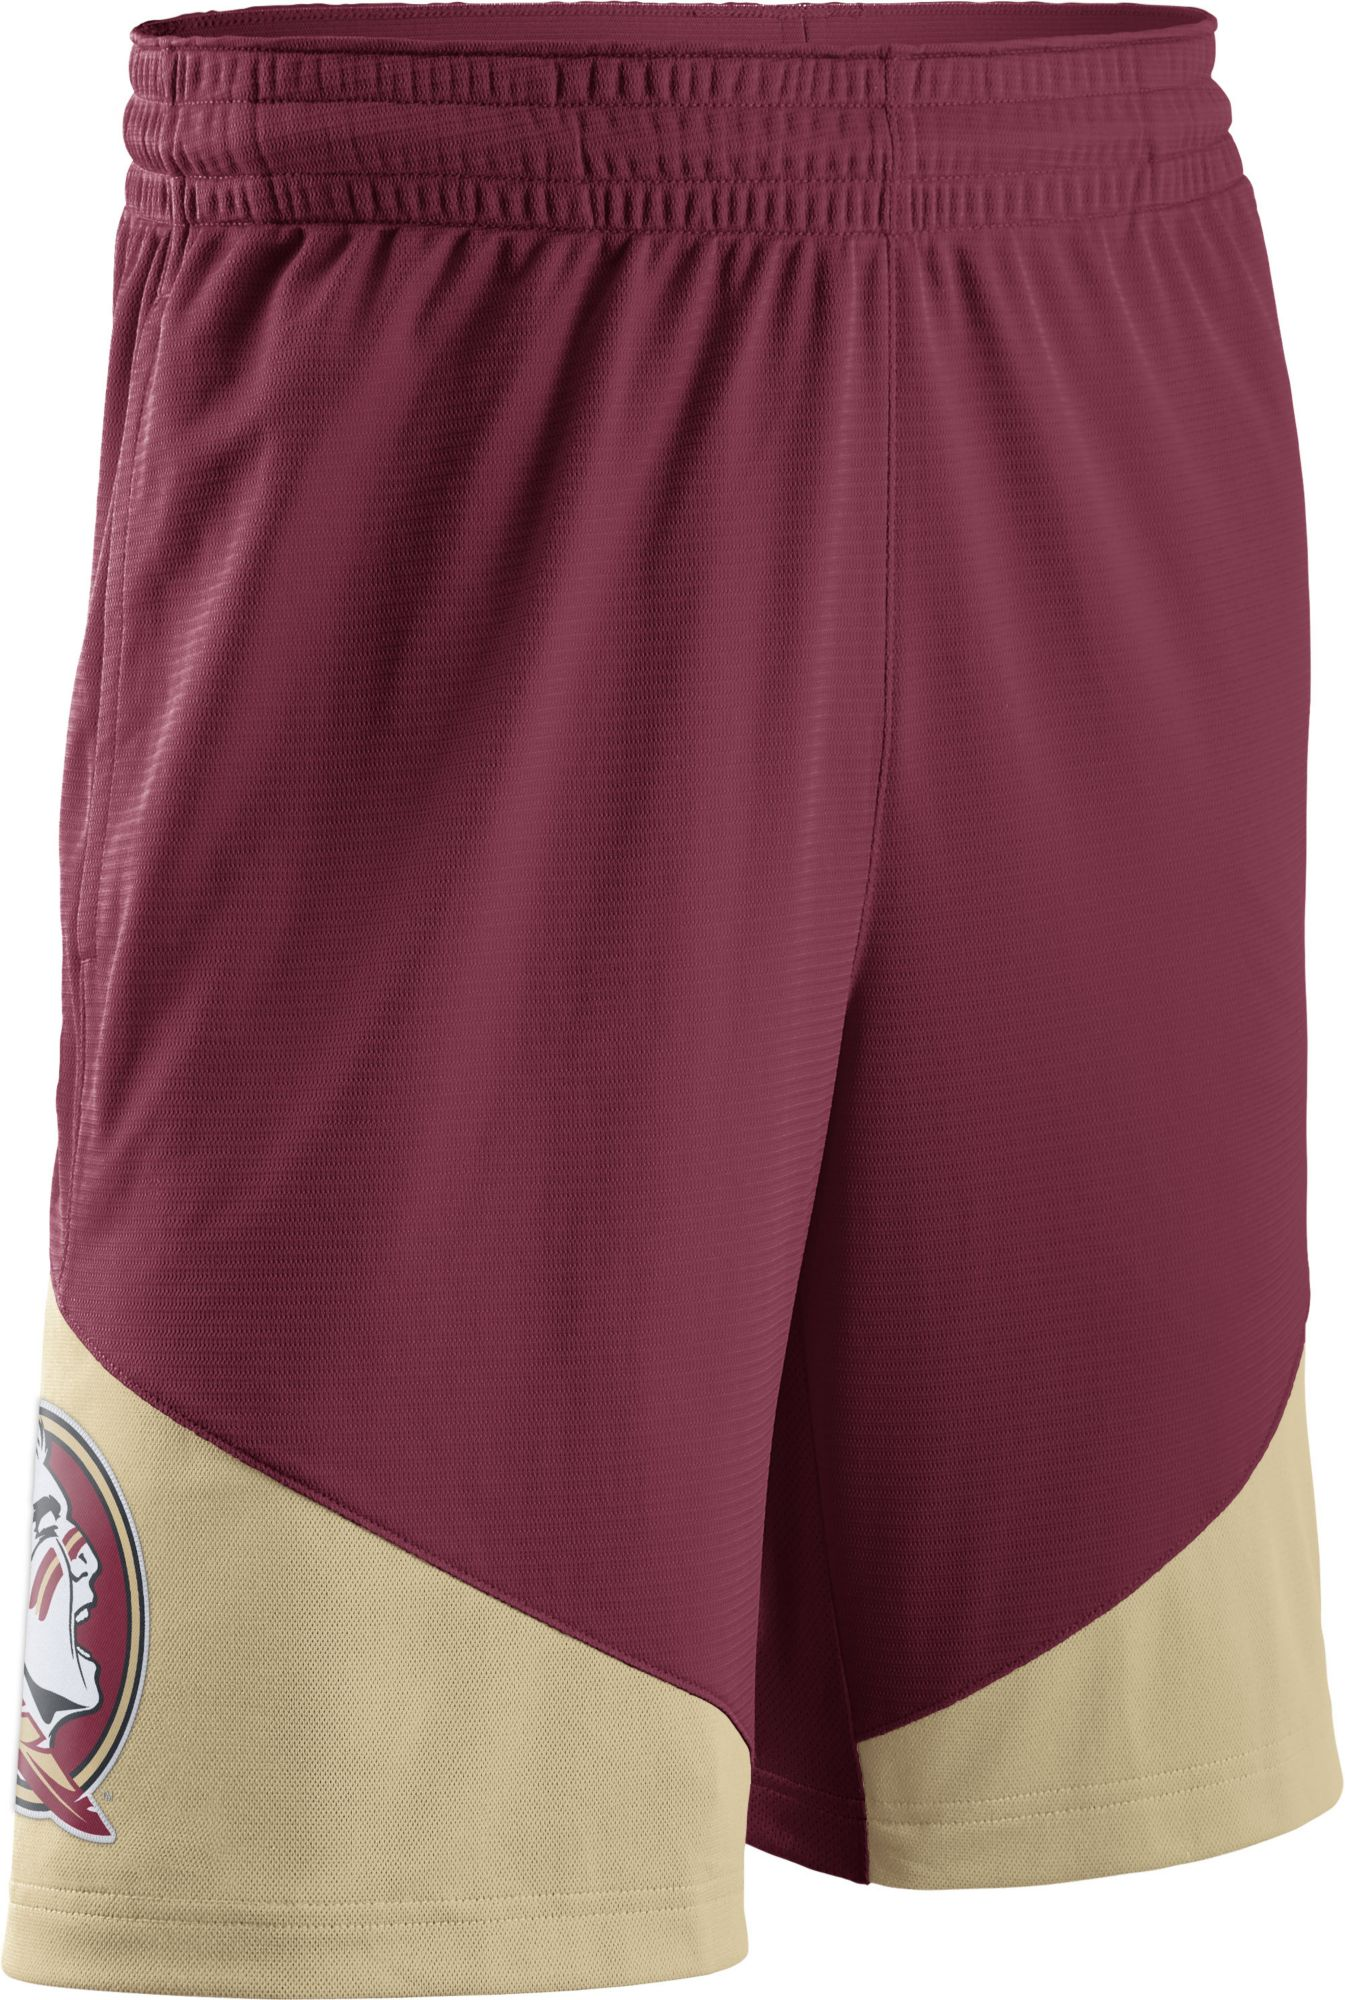 Nike Men's Florida State Seminoles Garnet/Gold New Classics Basketball  Shorts. 0:00. 0:00 / 0:00. noImageFound ???